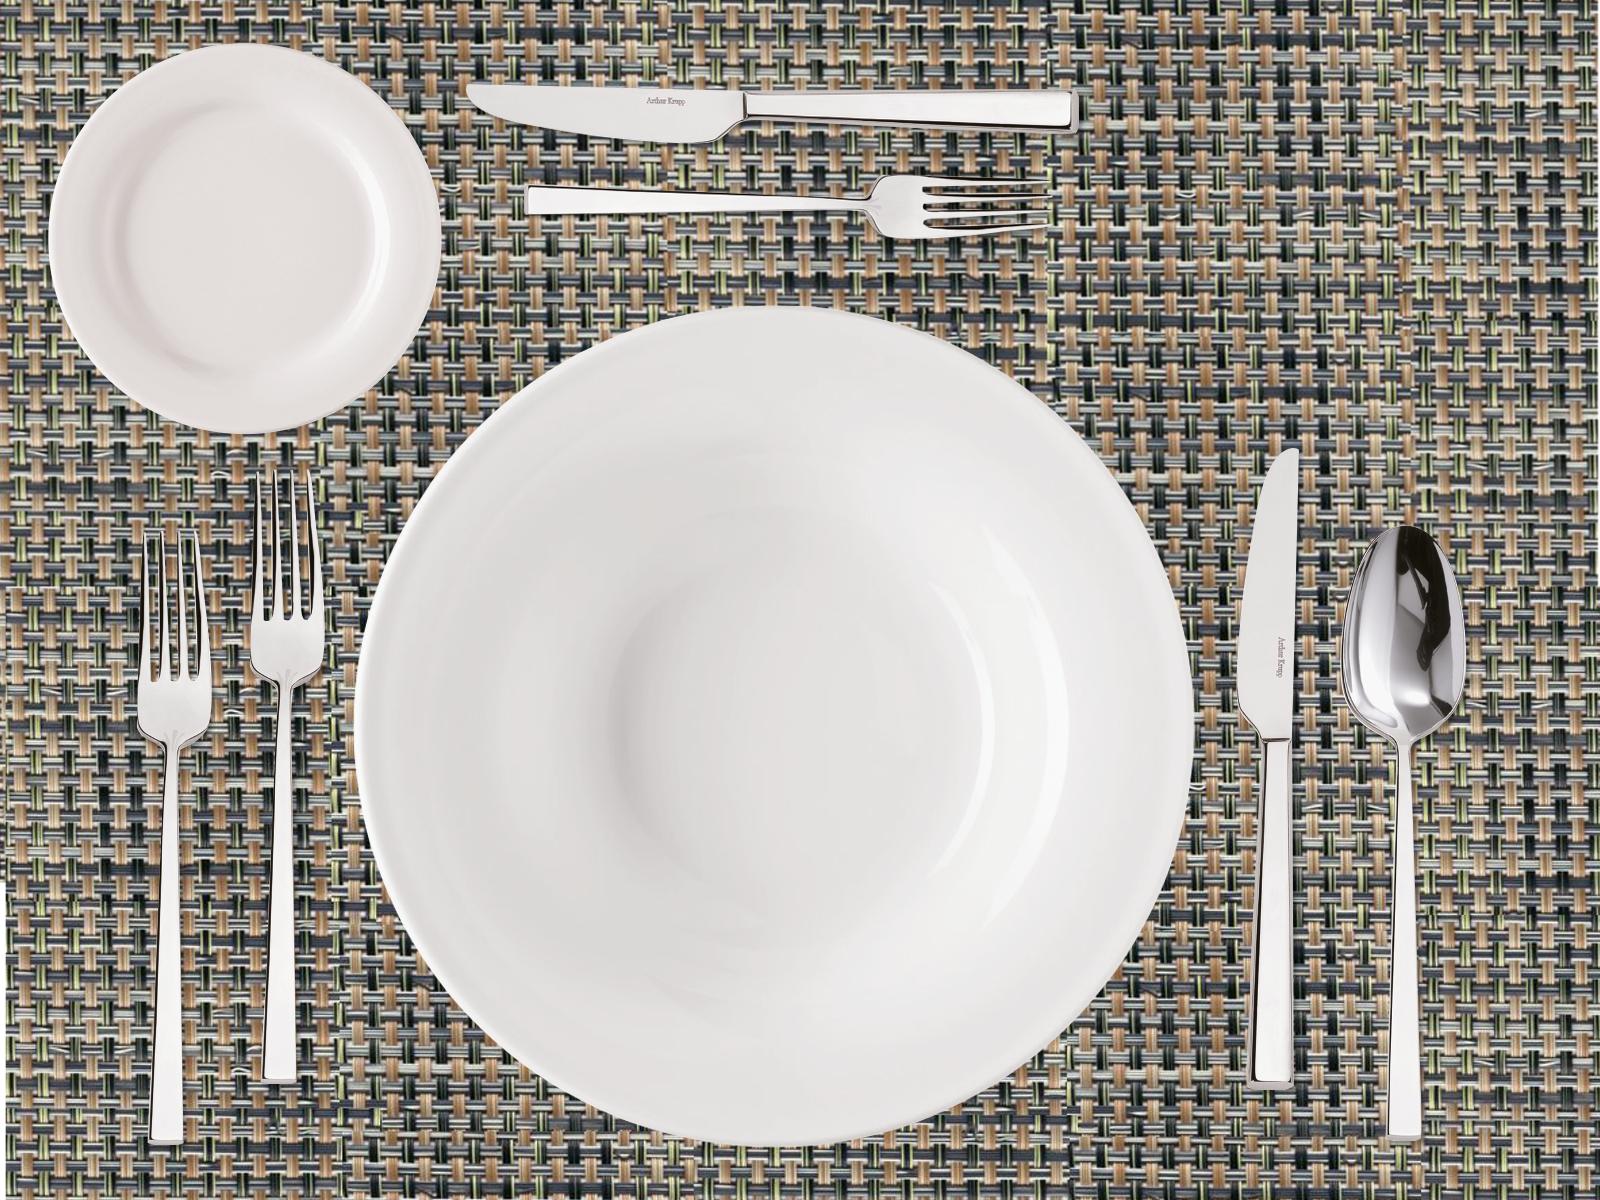 Gourmet >> NEW UOVO Gourmet plate